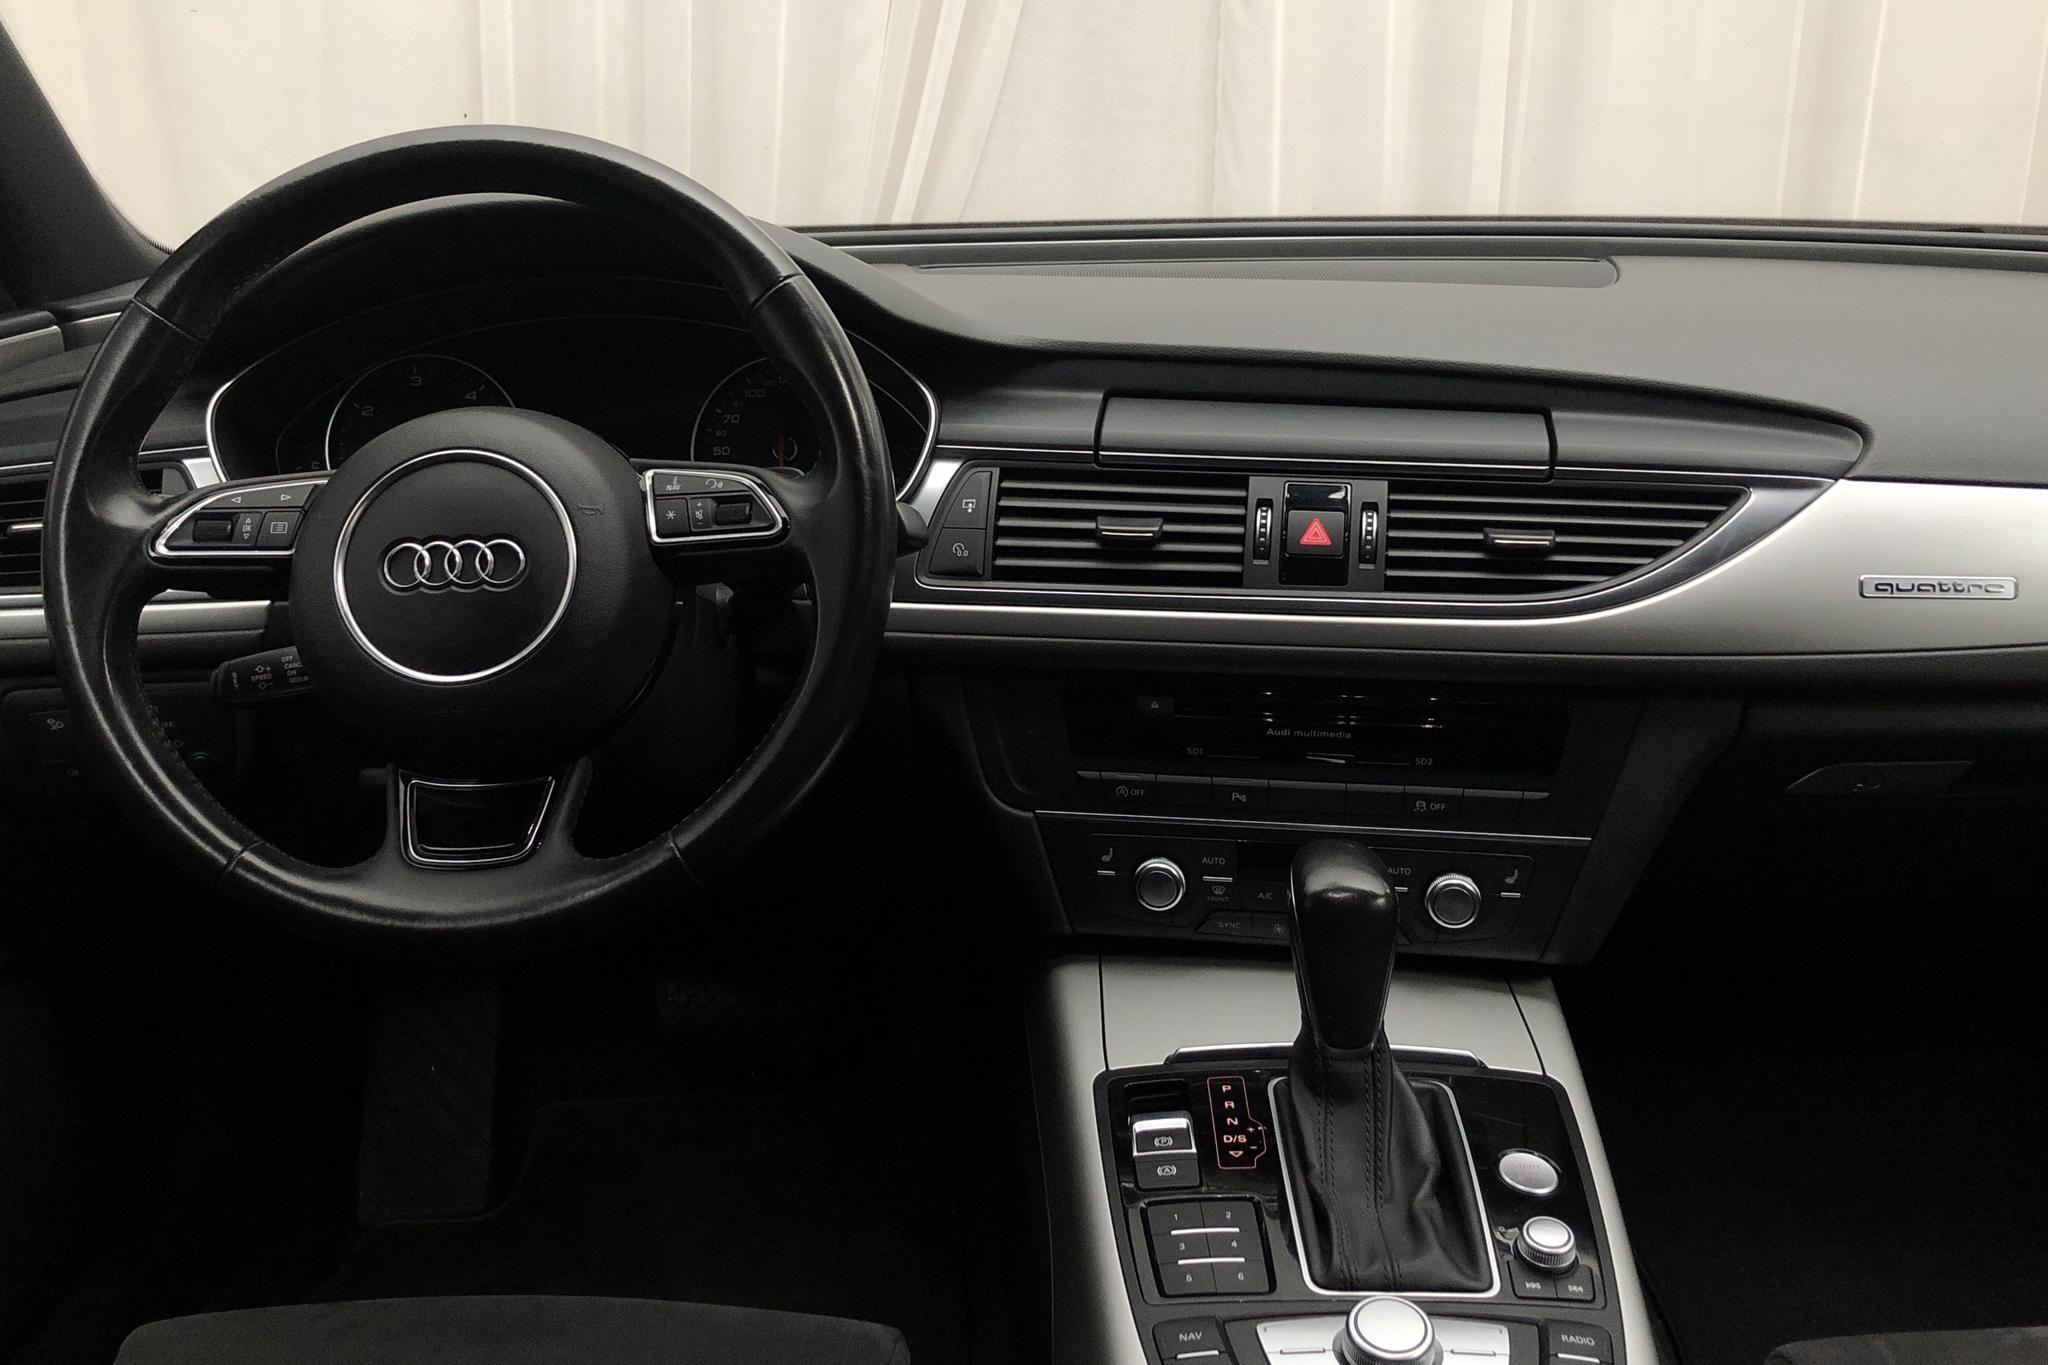 Audi A6 2.0 TDI Avant quattro (190hk) - 161 650 km - Automatic - black - 2017